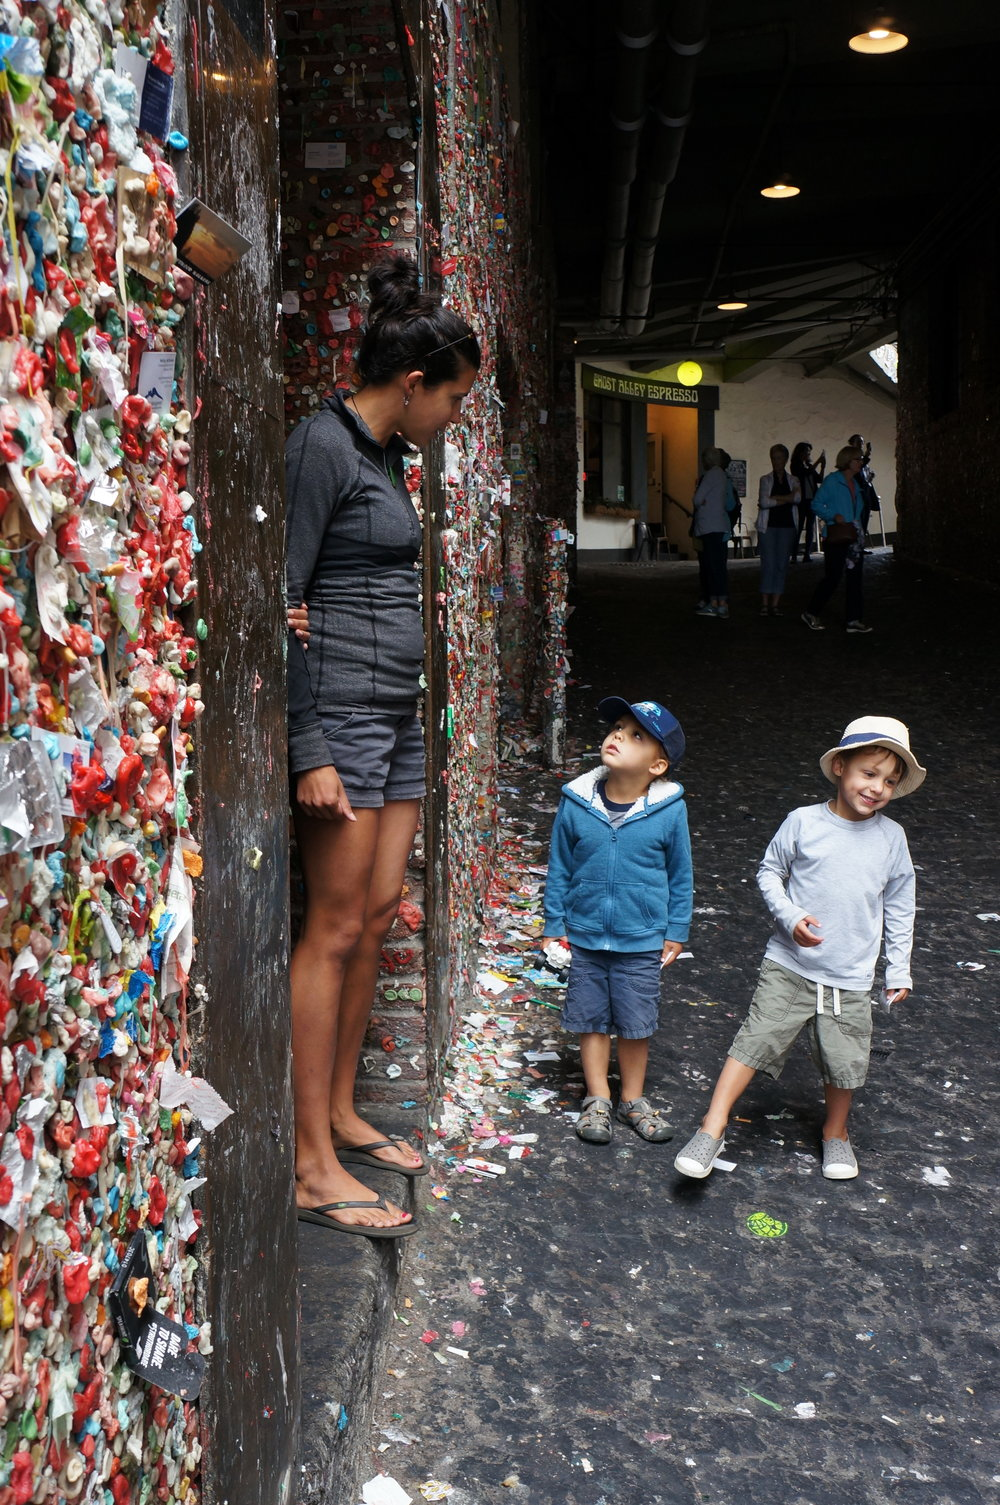 Seattle Gum Wall (EW!)